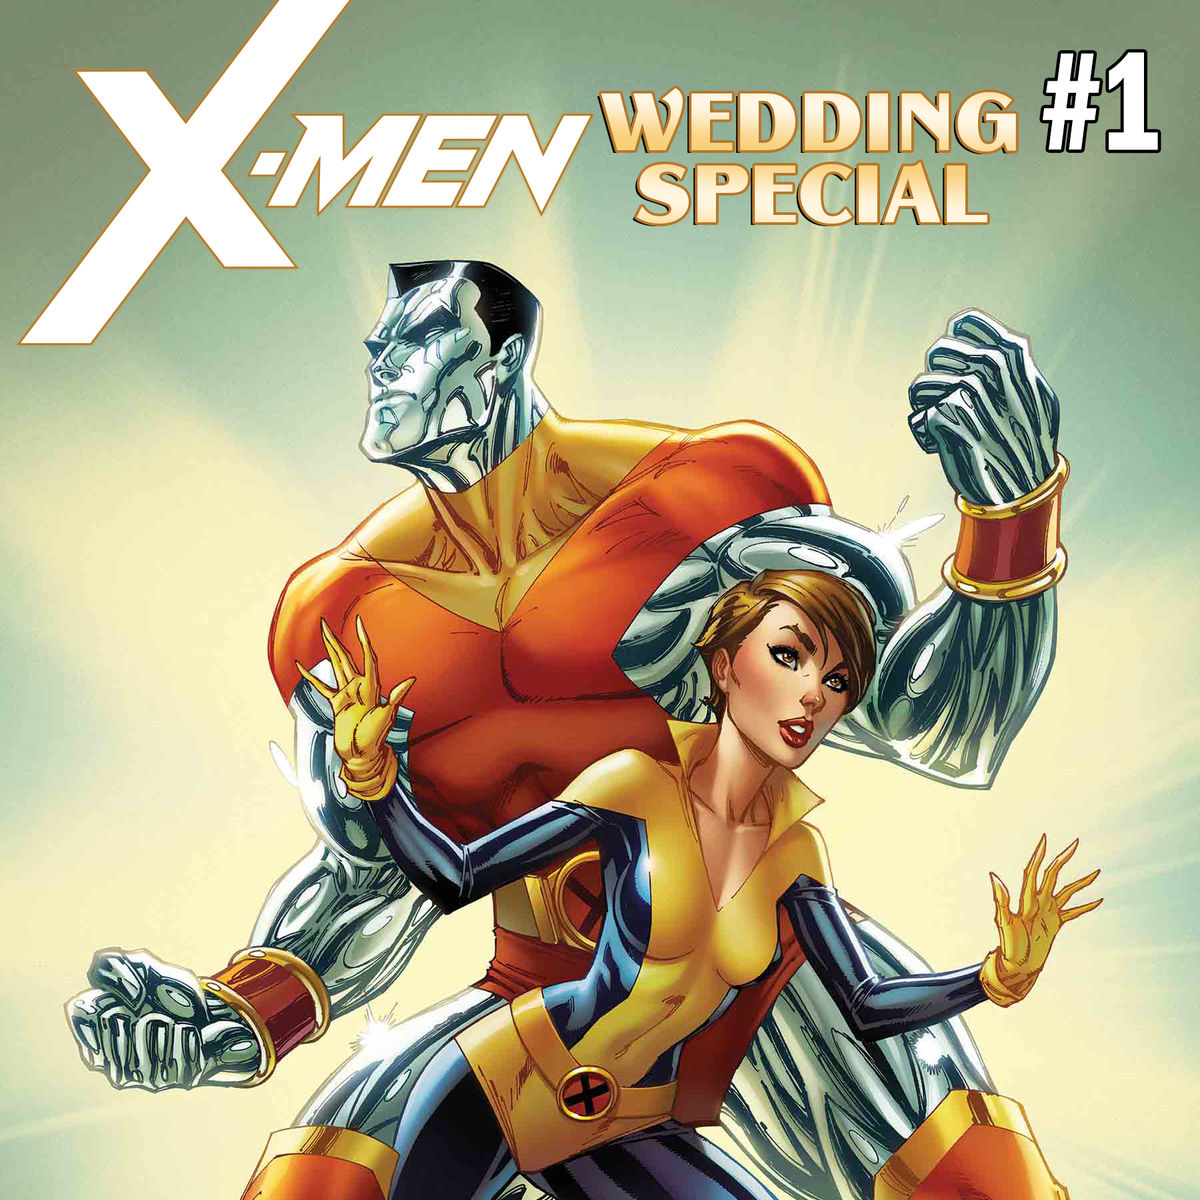 xmen_wedding_special_001.jpg